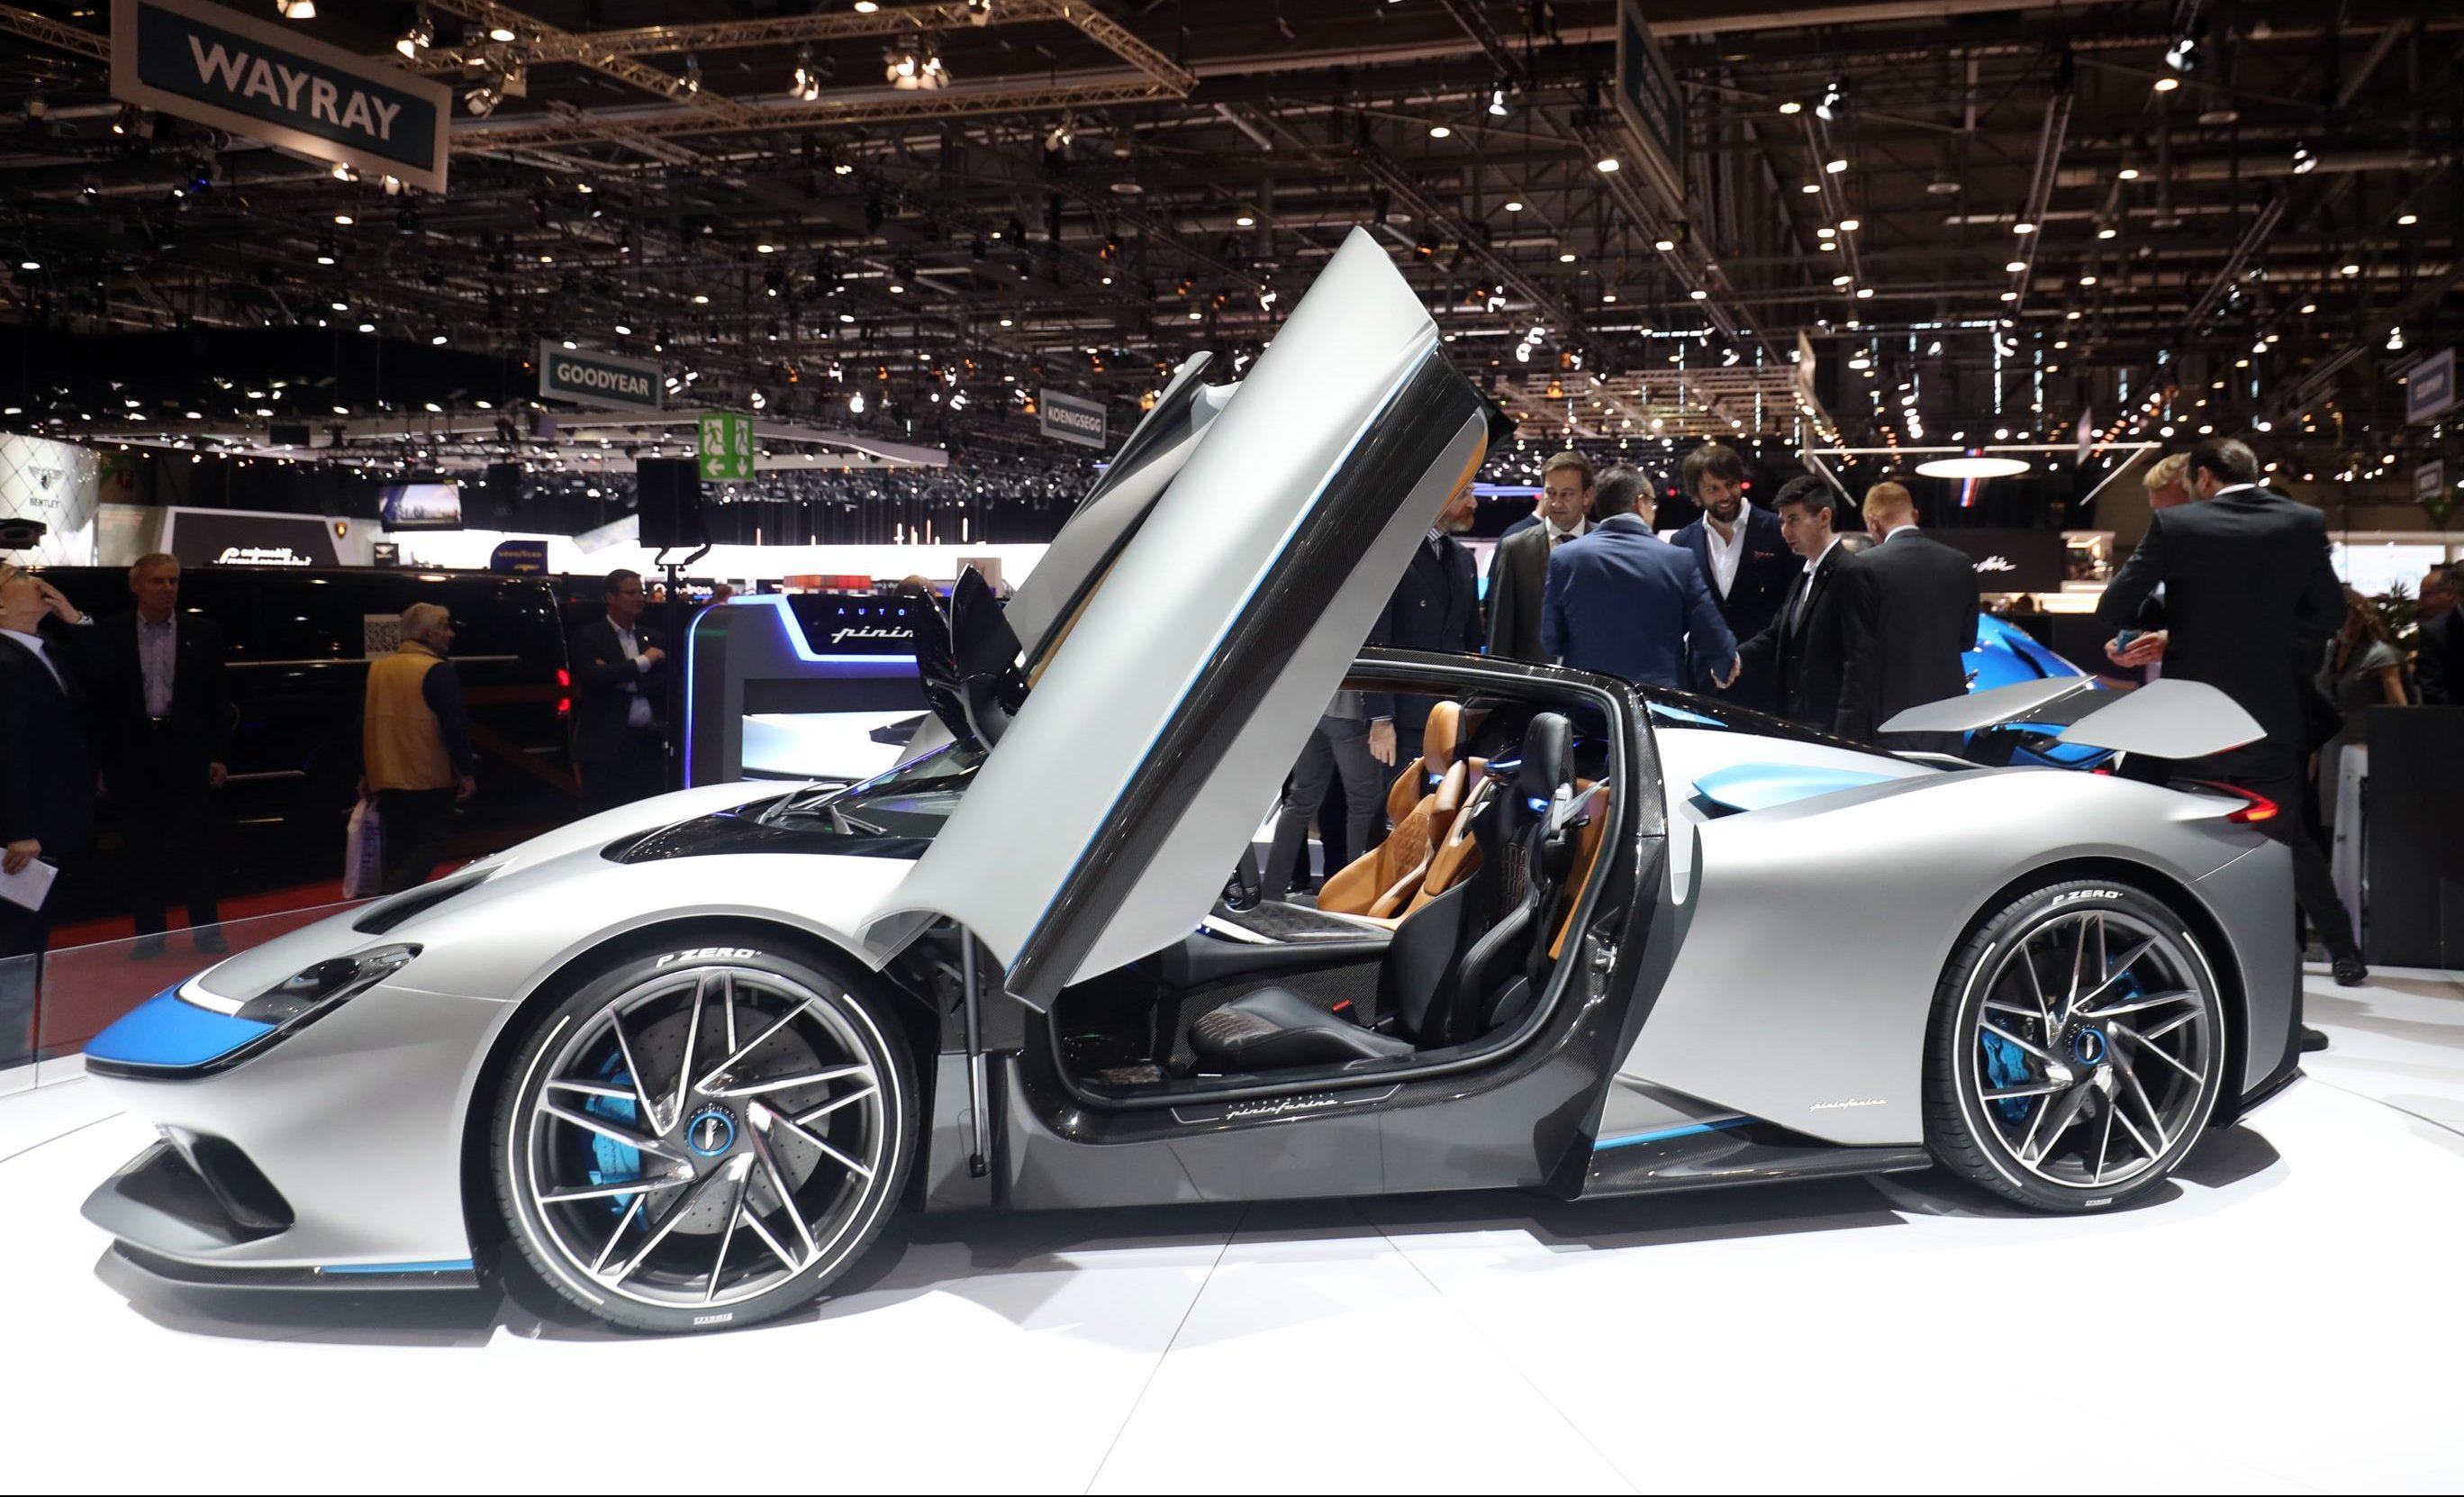 Top 10 craziest, most interesting supercars at 2019 Geneva Motor Show